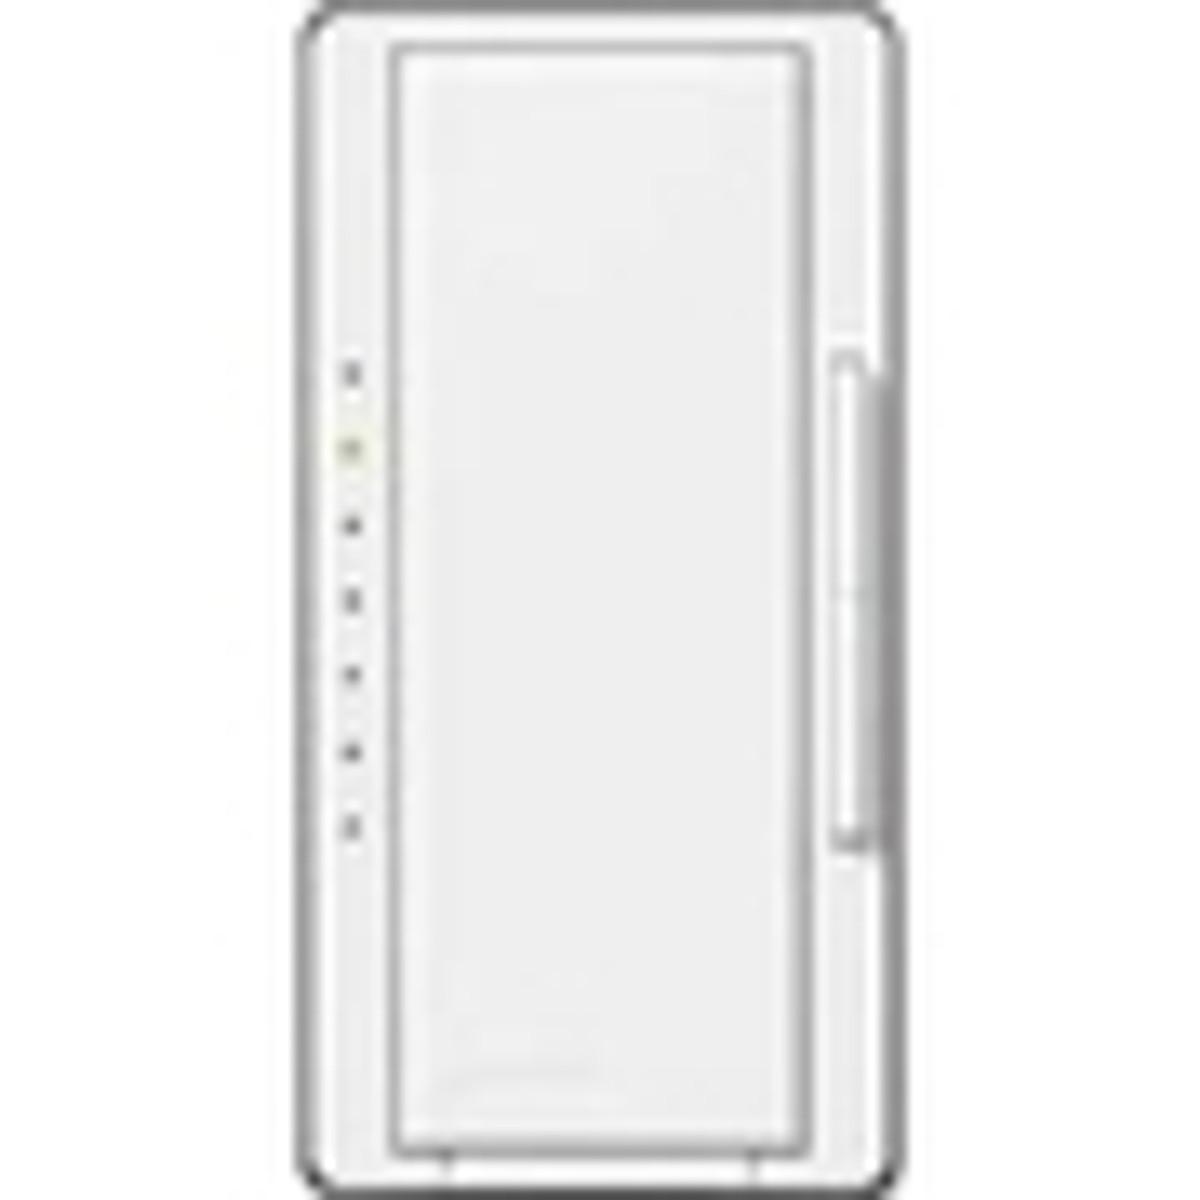 LumeGen Light Controls